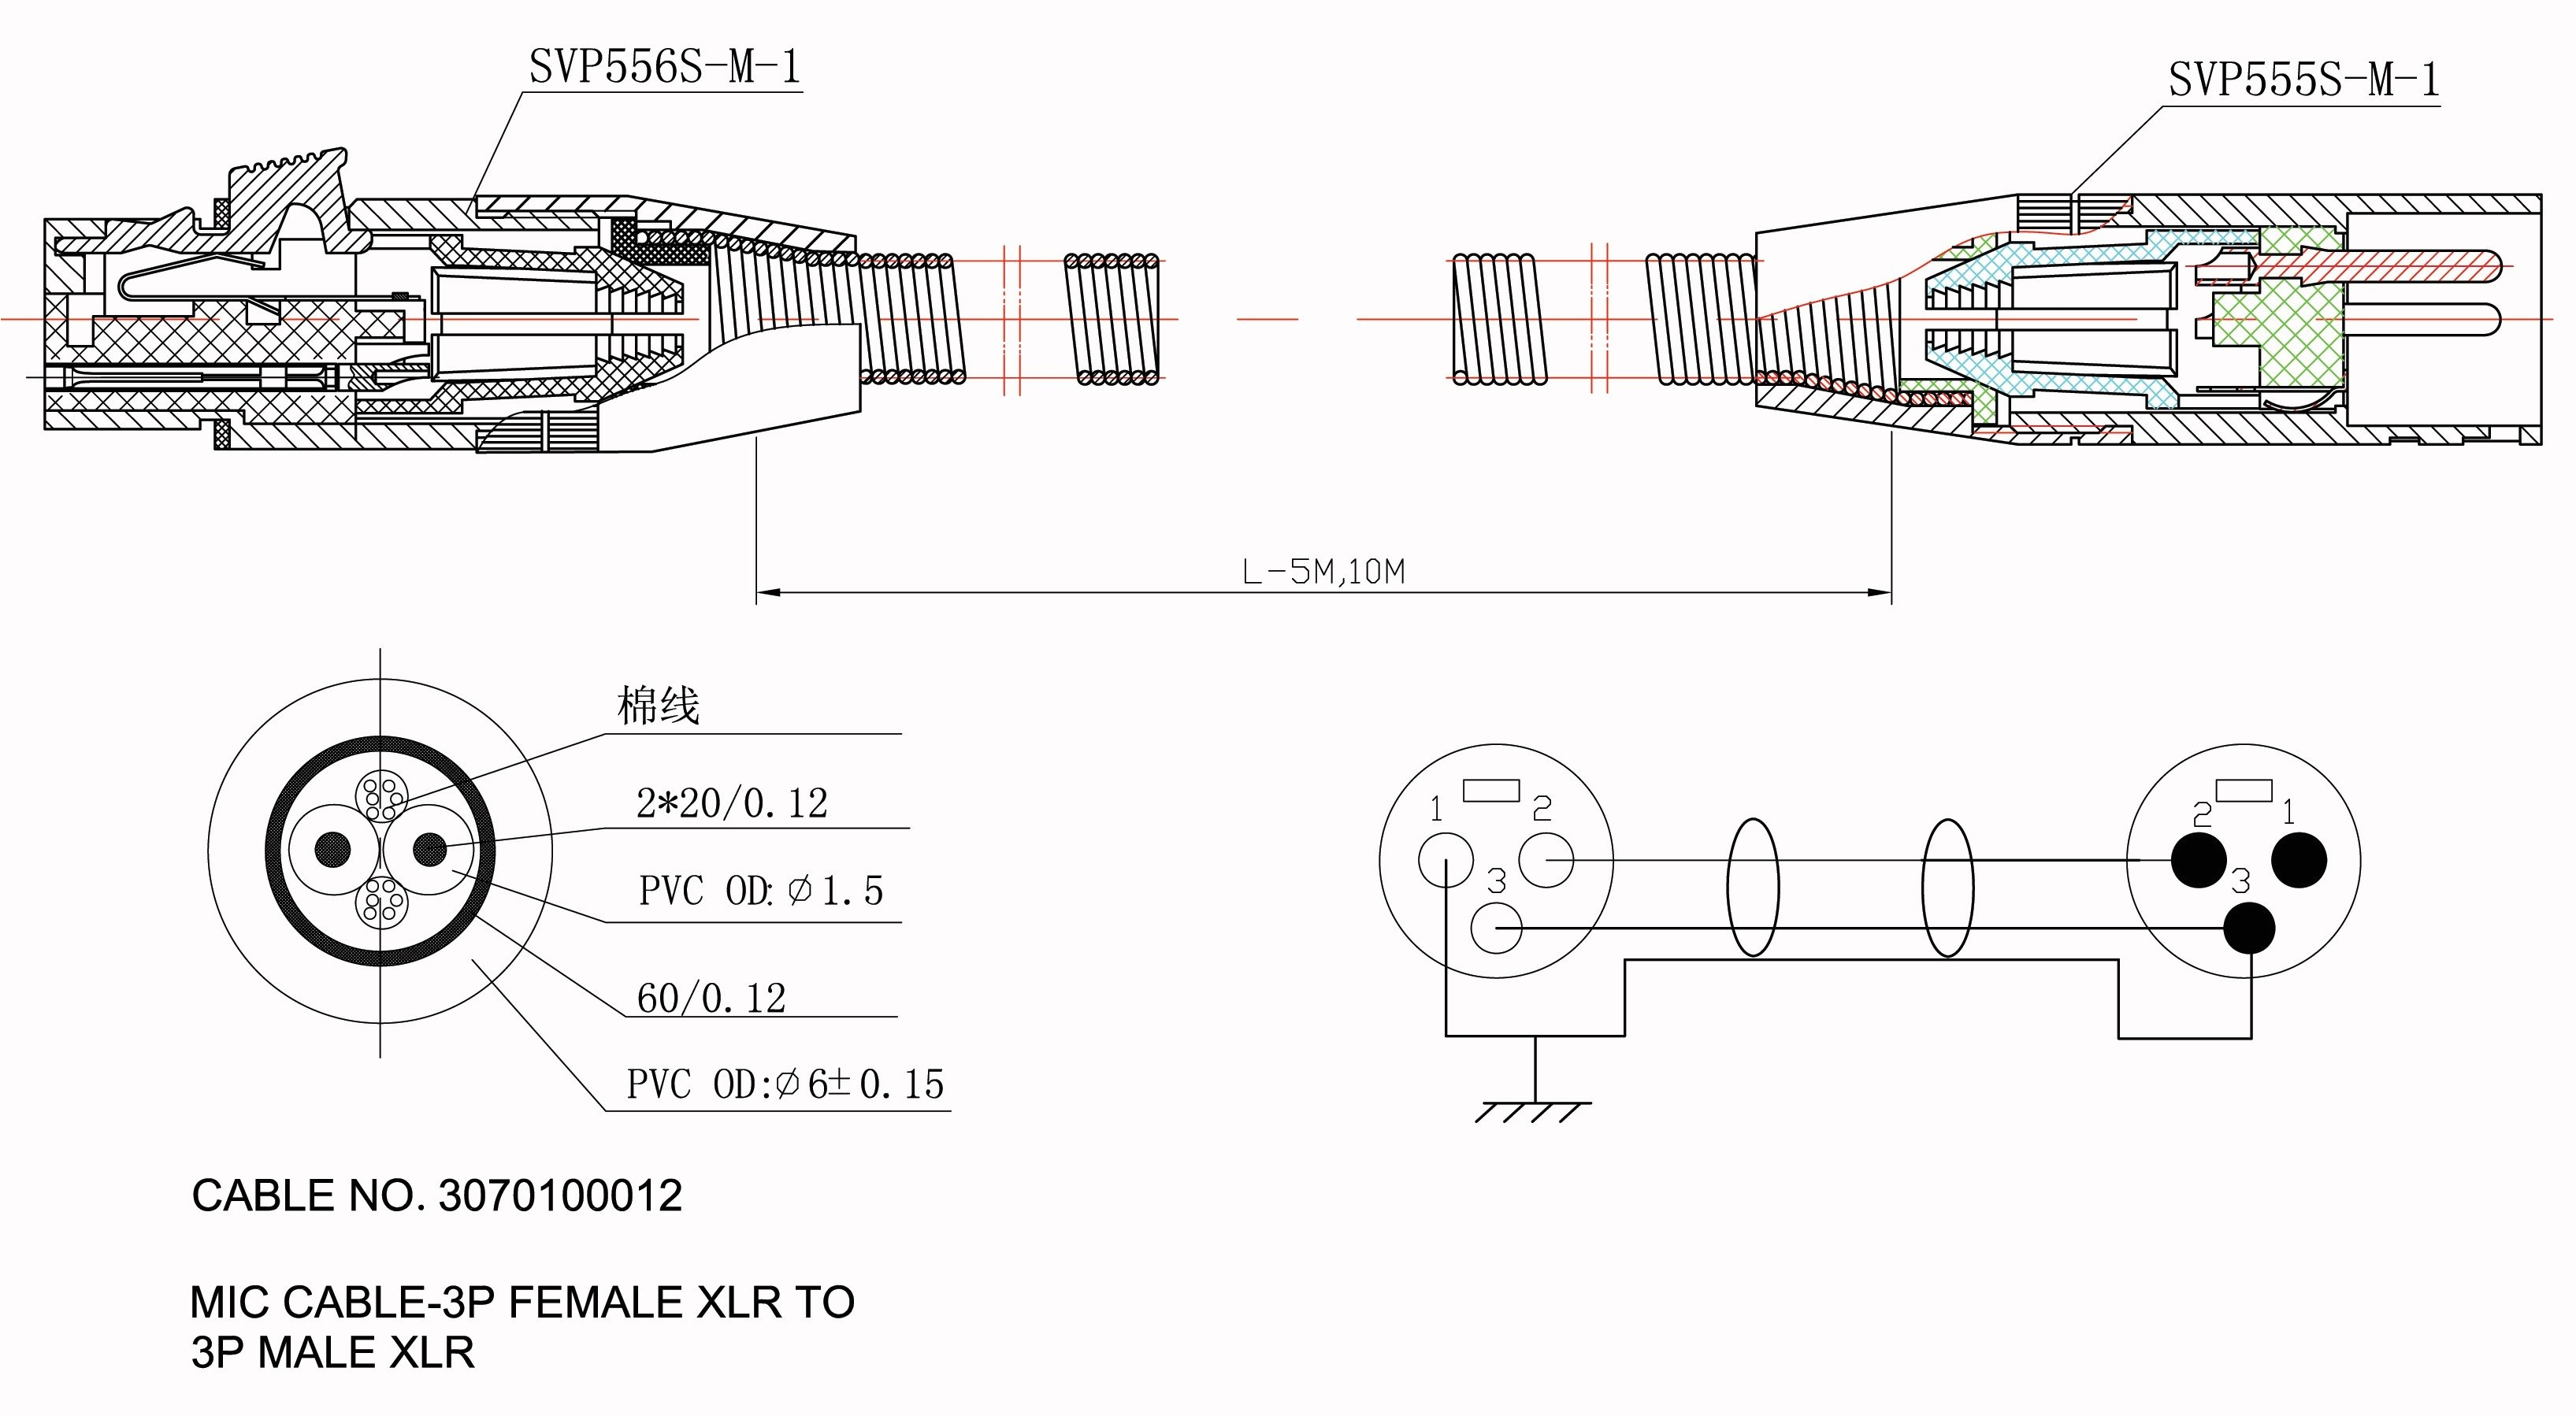 extension cord 20a 250v wiring diagram detailed wiring diagram extension cord 20a 250v wiring diagram source 20a 250v plug